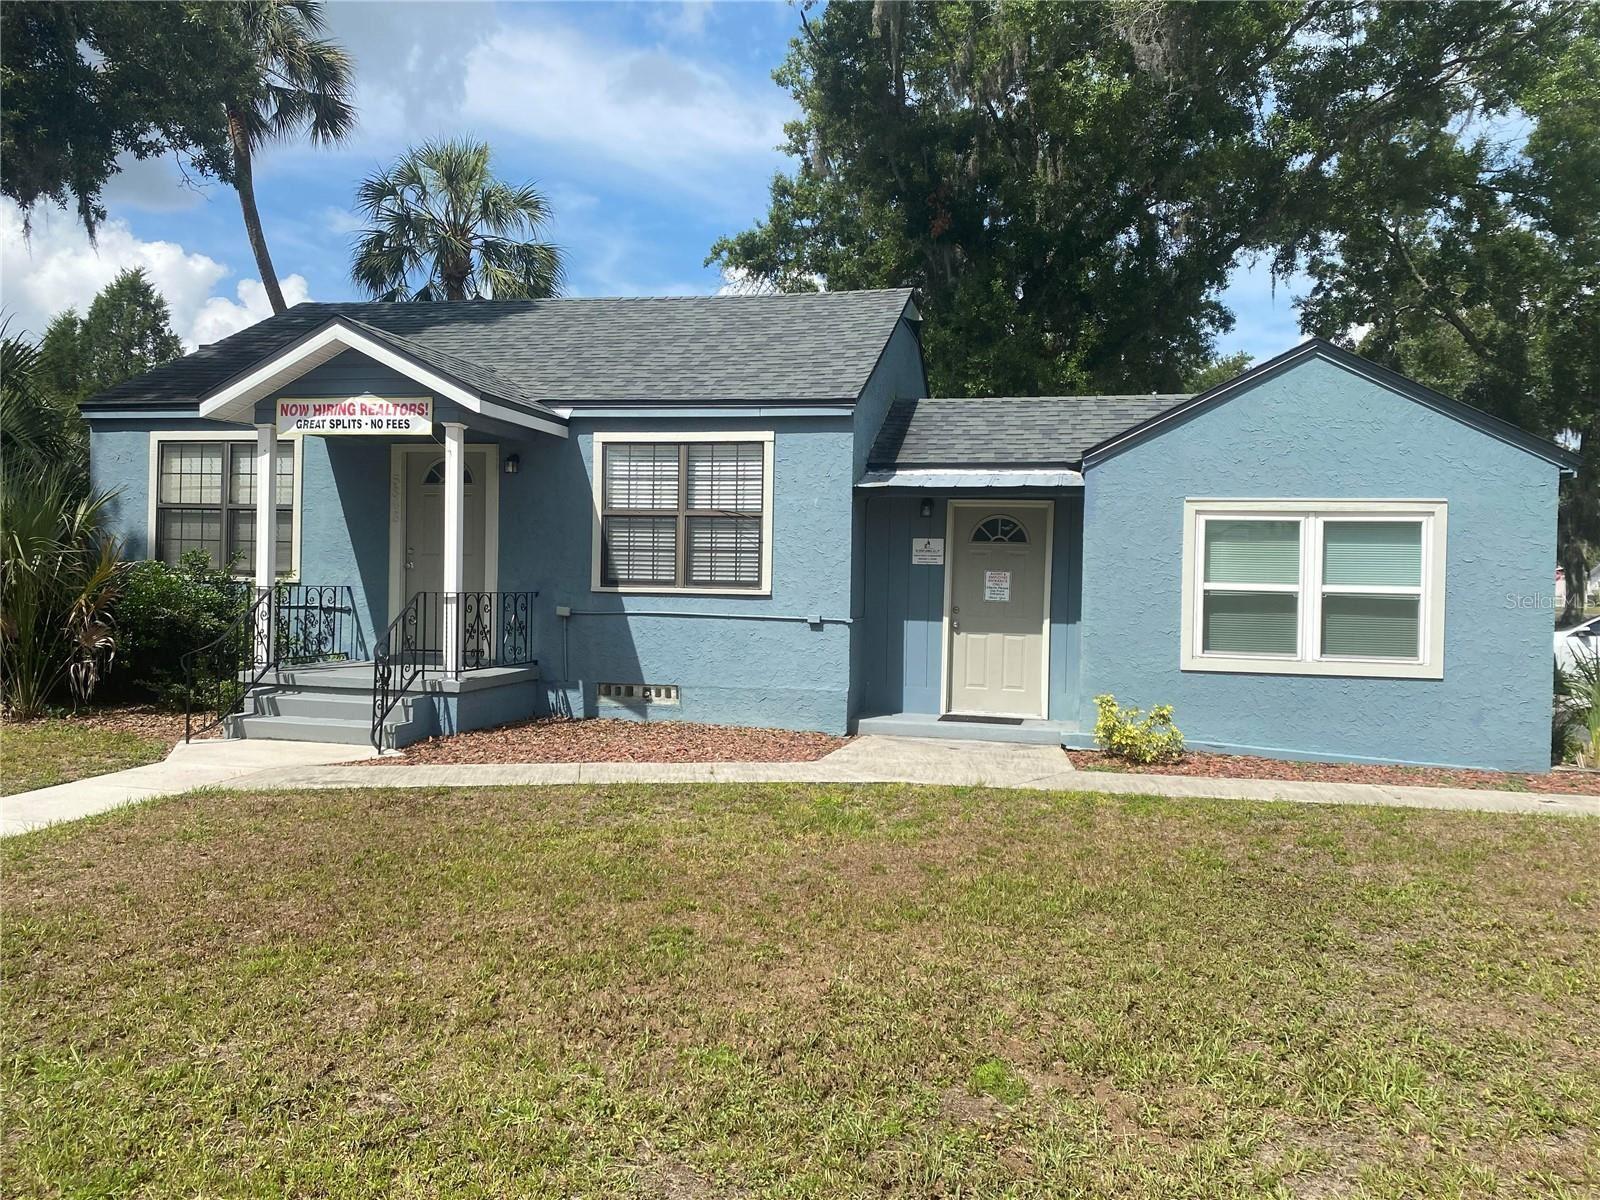 5343 6TH STREET, Zephyrhills, FL 33542 - MLS#: T3313574